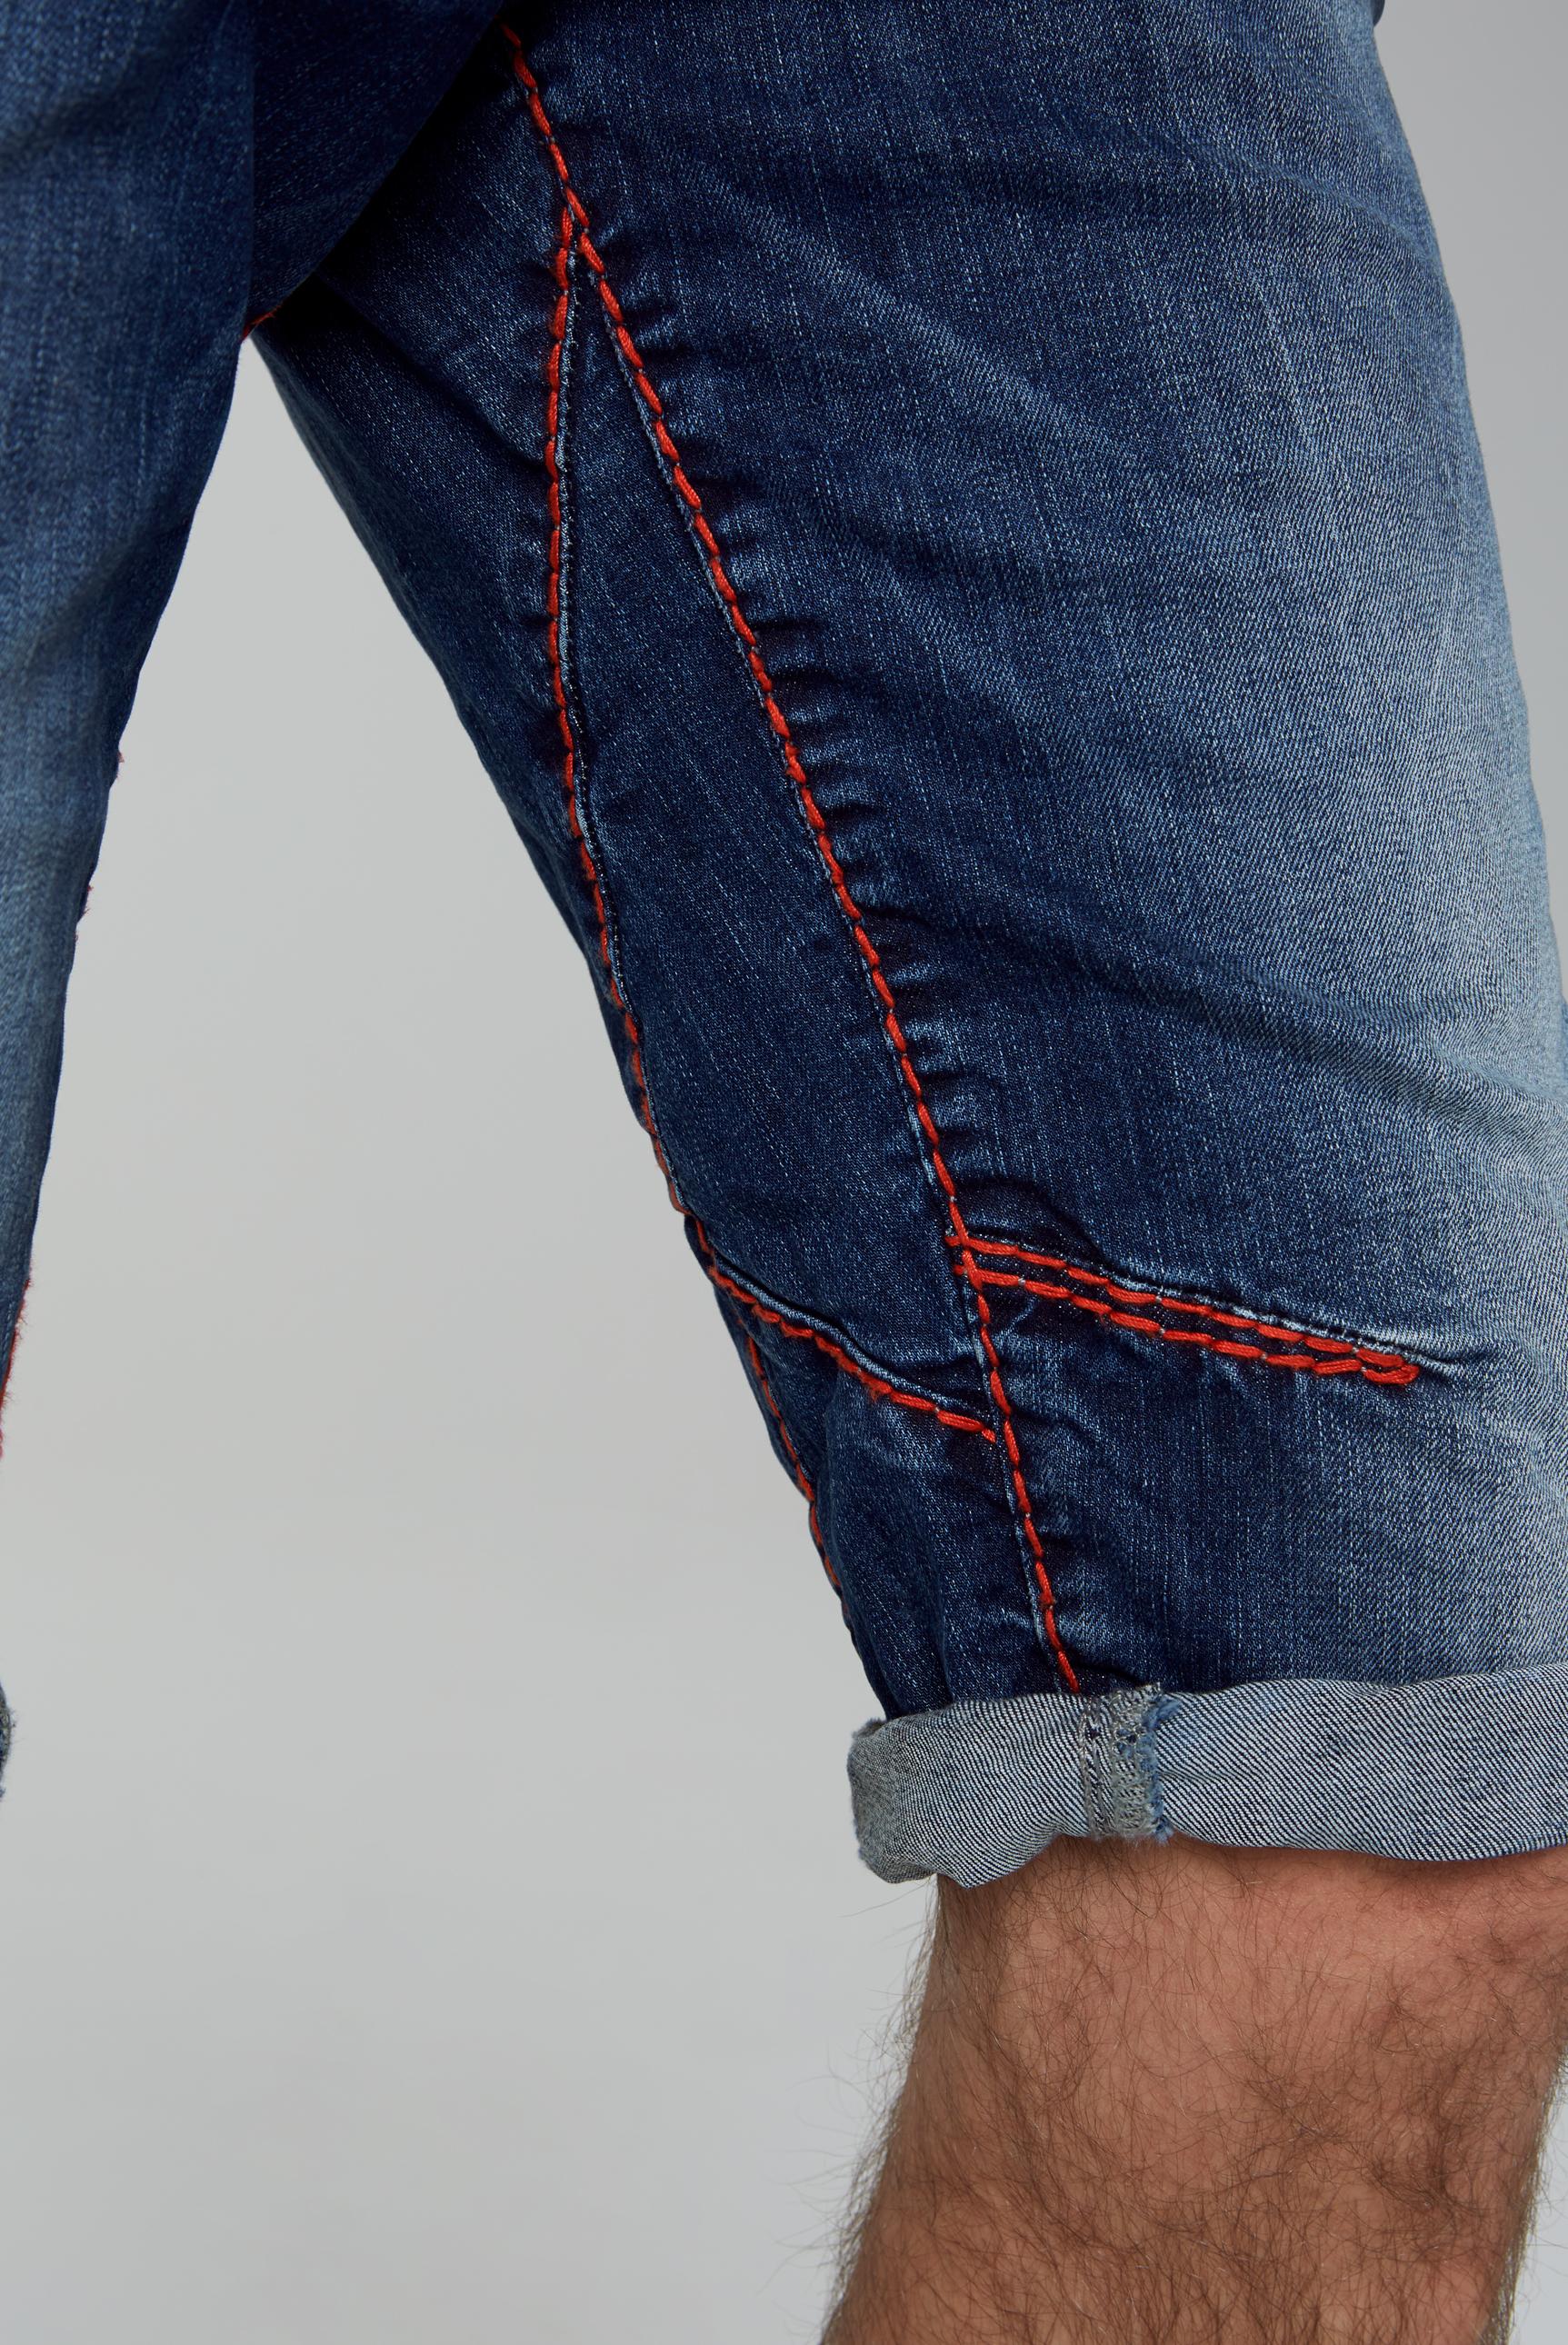 JA:CK Skater Shorts mit farbigen Nähten